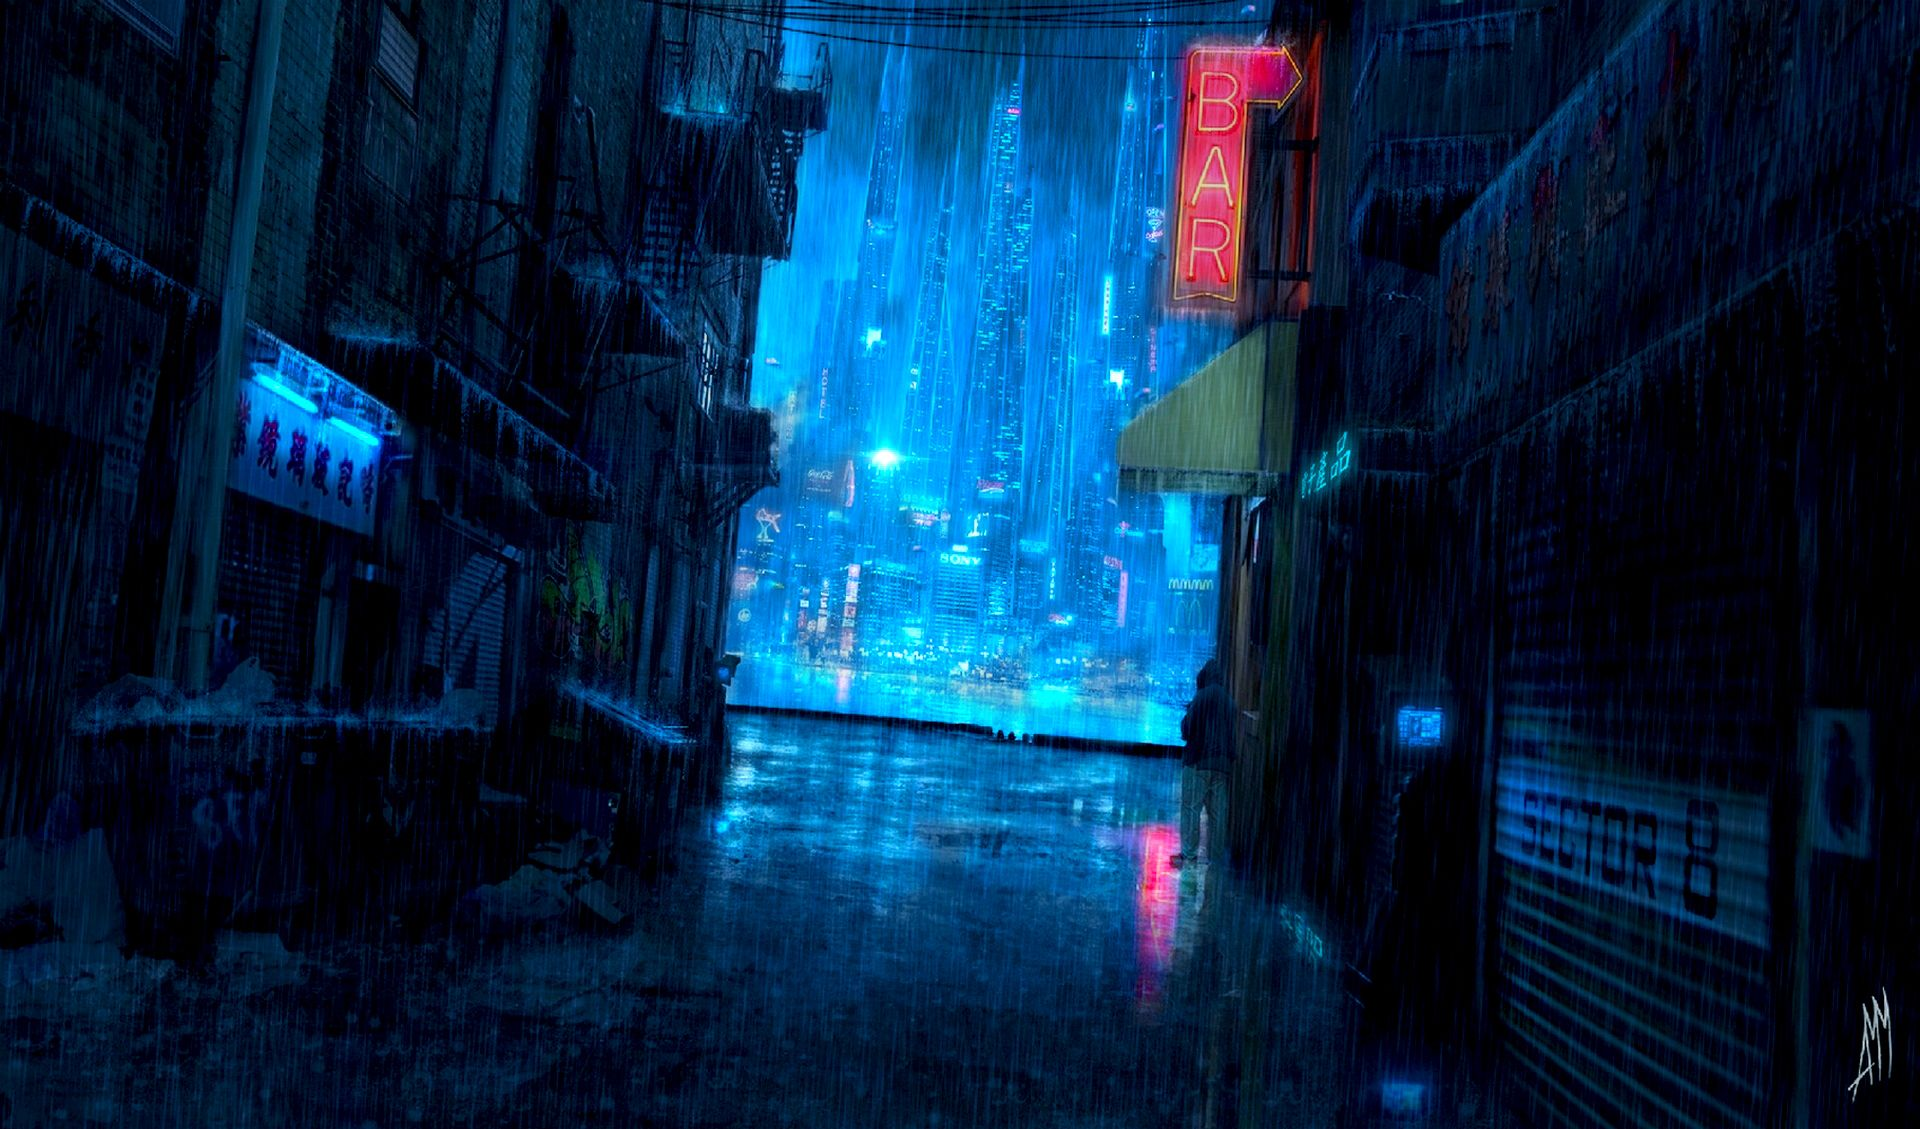 Dark Anime Scenery Wallpapers High Definition For Free Wallpaper Anime Scenery Wallpaper Anime Scenery Cyberpunk City